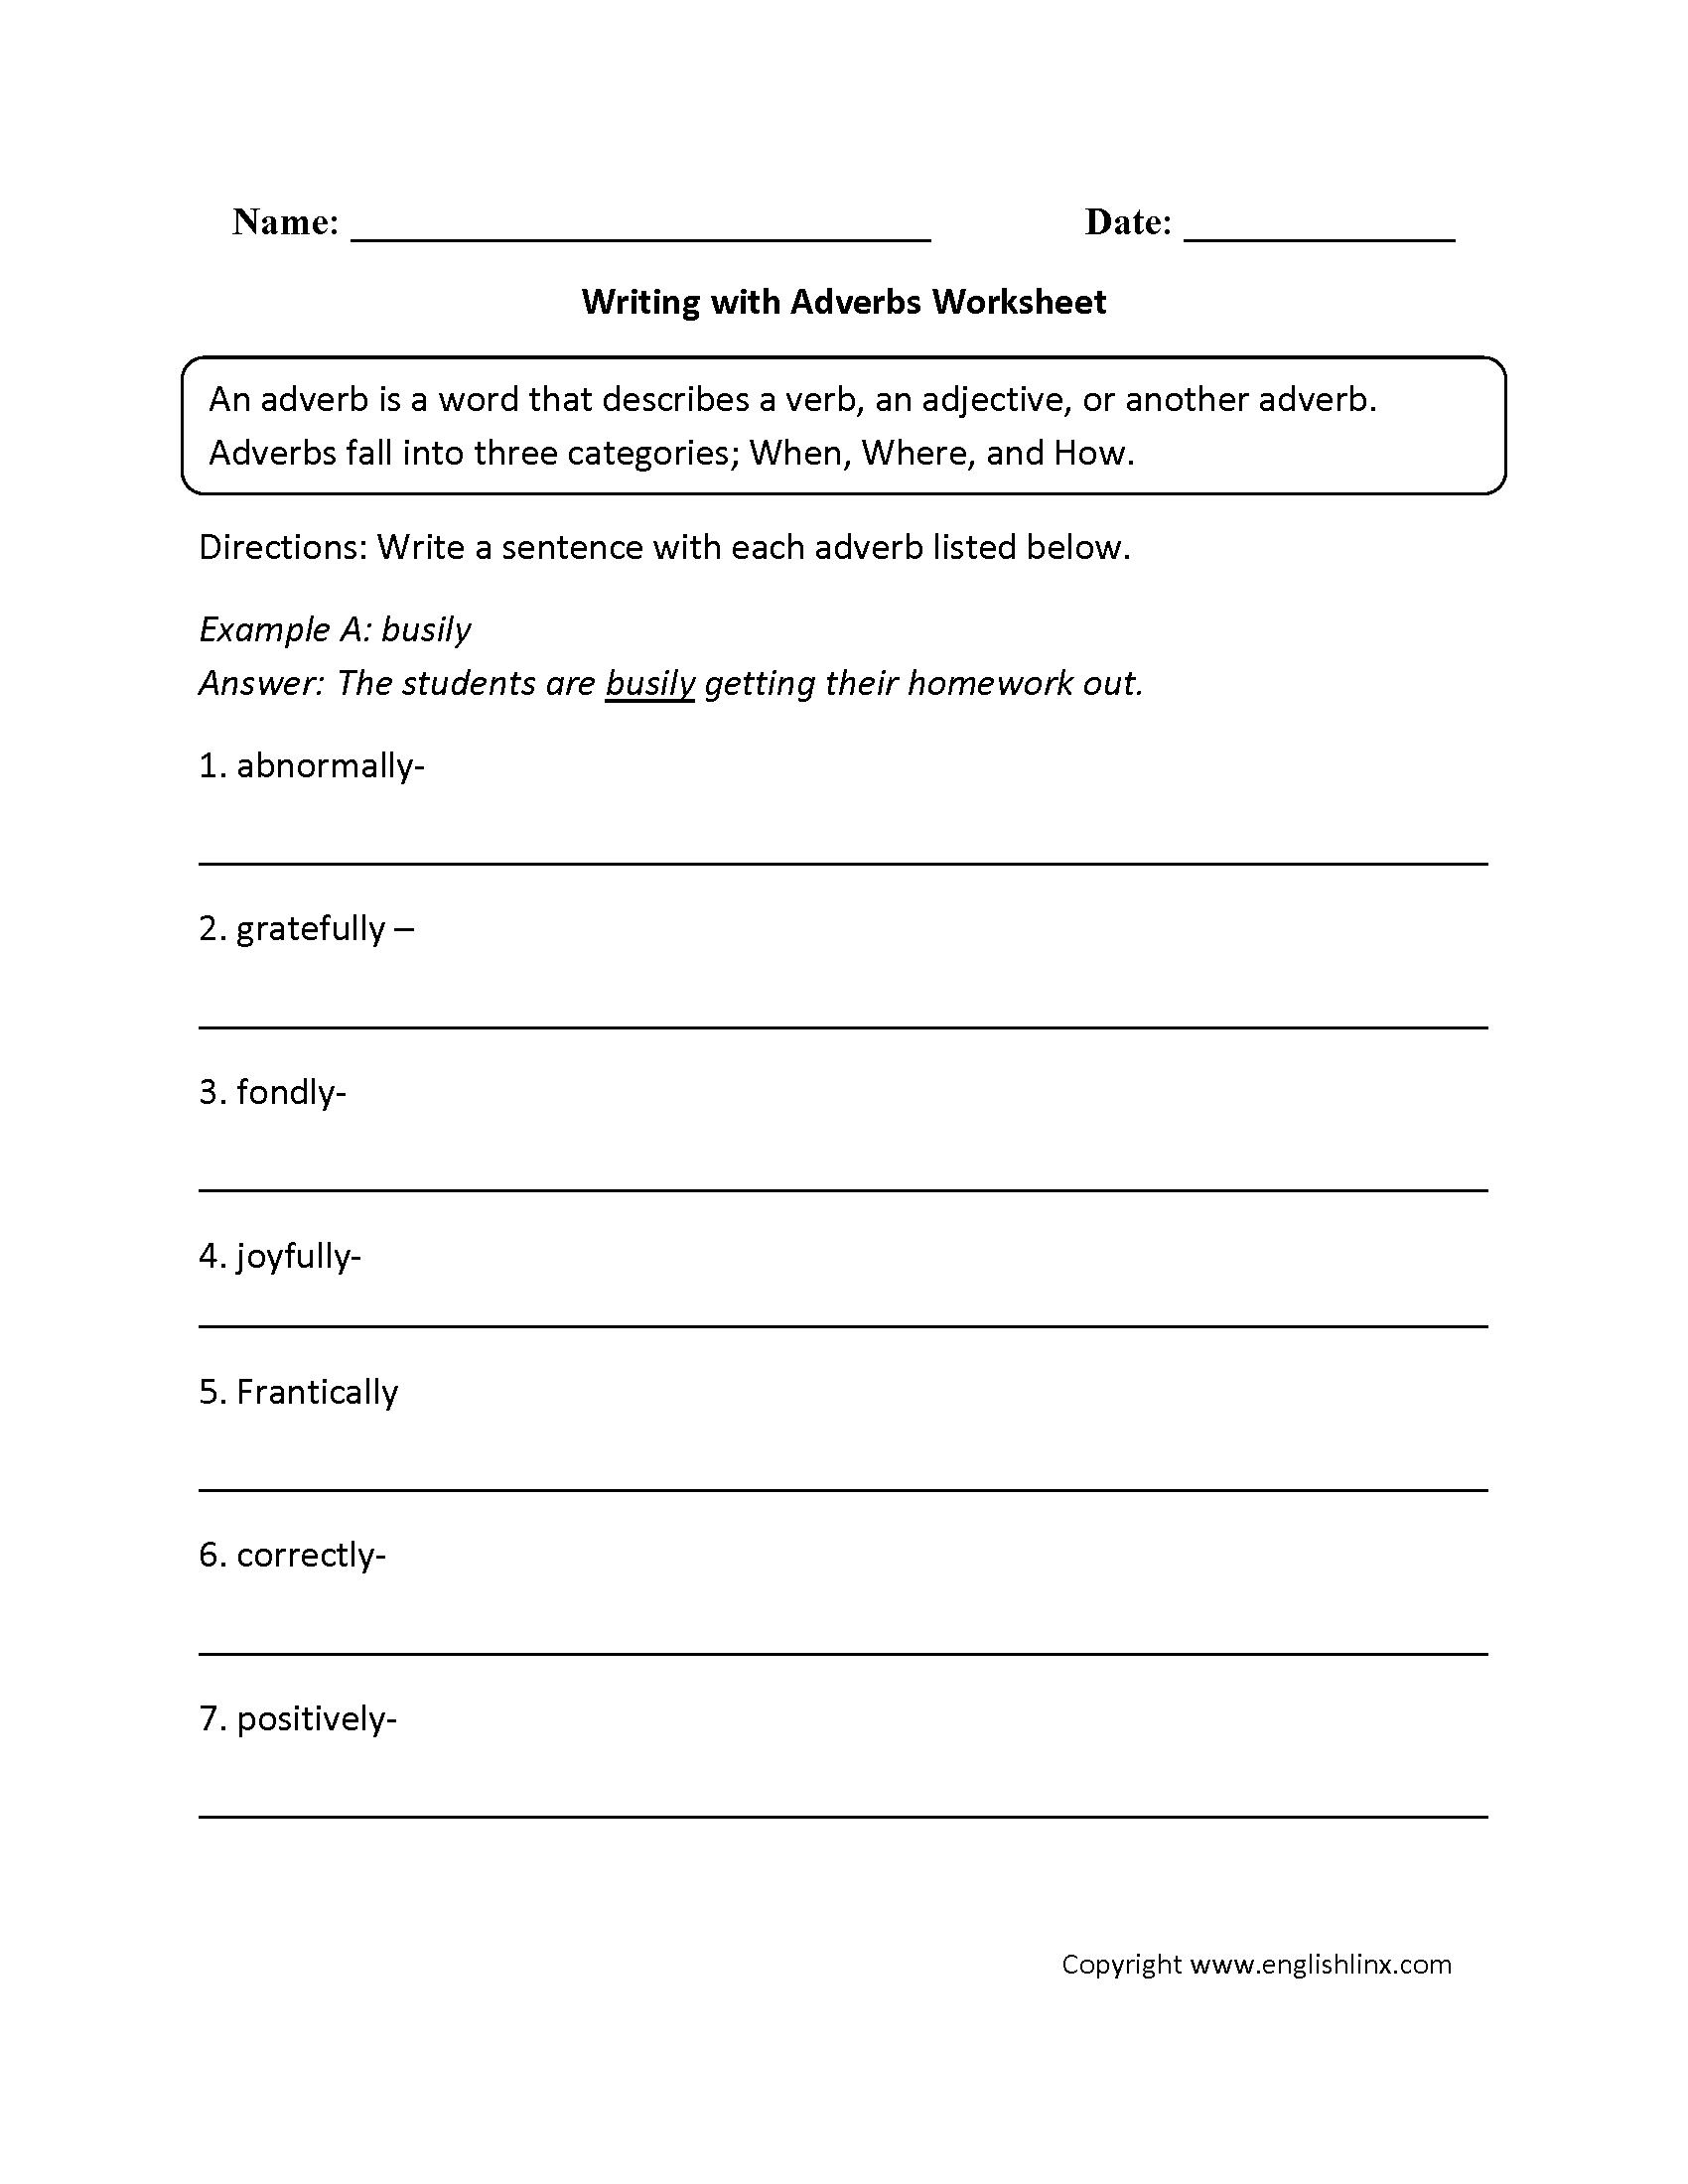 Adverbs Worksheets | Regular Adverbs Worksheets | Free Printable Worksheets On Adverbs For Grade 5